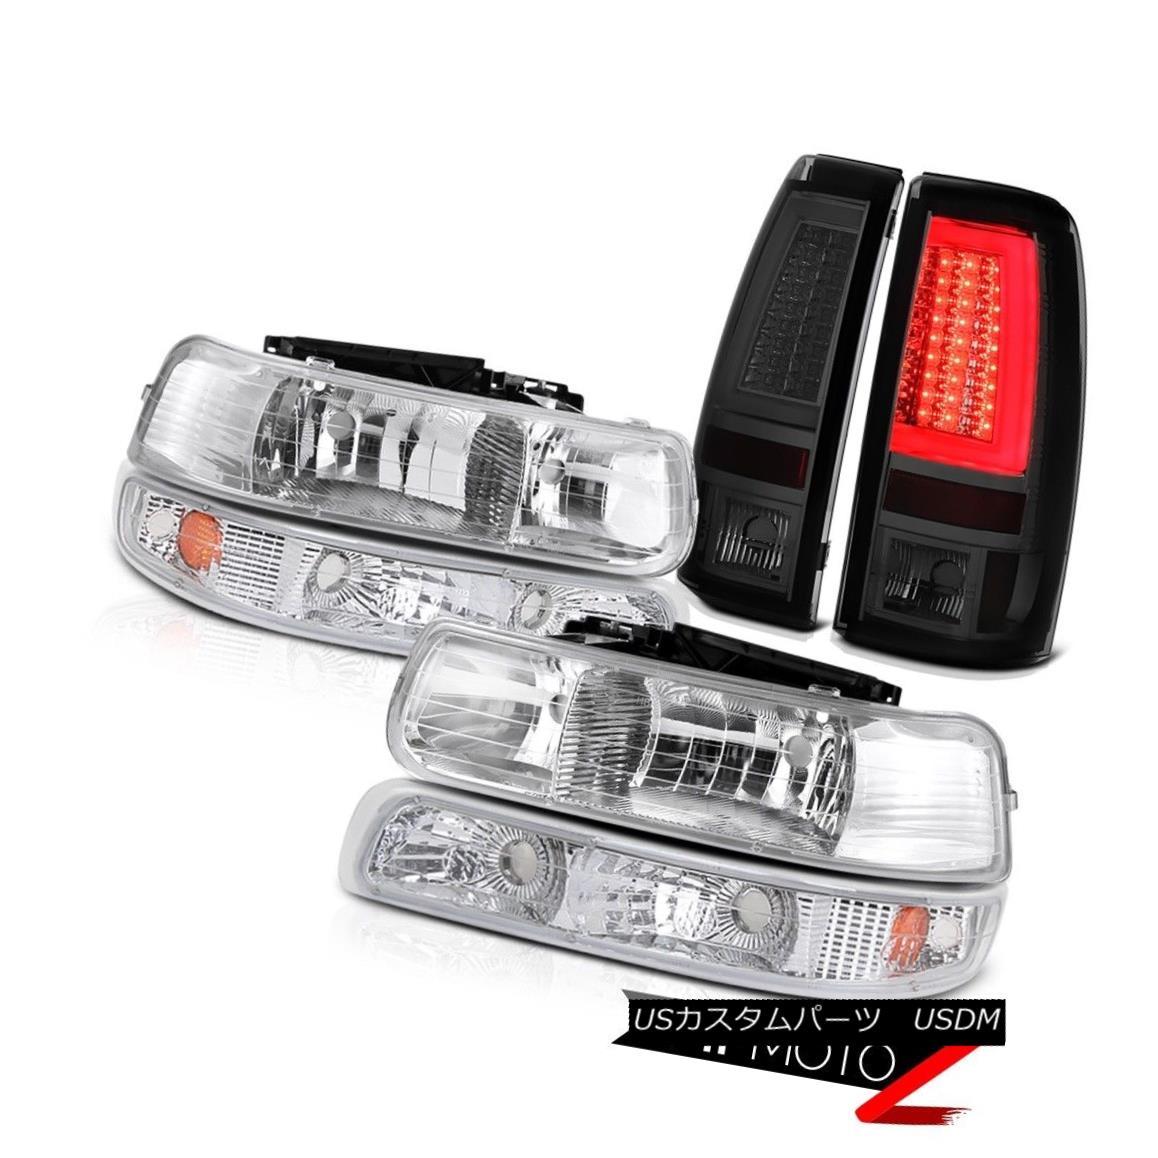 <title>おすすめ 車用品 バイク用品 >> パーツ ライト ランプ テールライト 99-02 Silverado 2500HD Smoked Taillights Headlights Signal Light